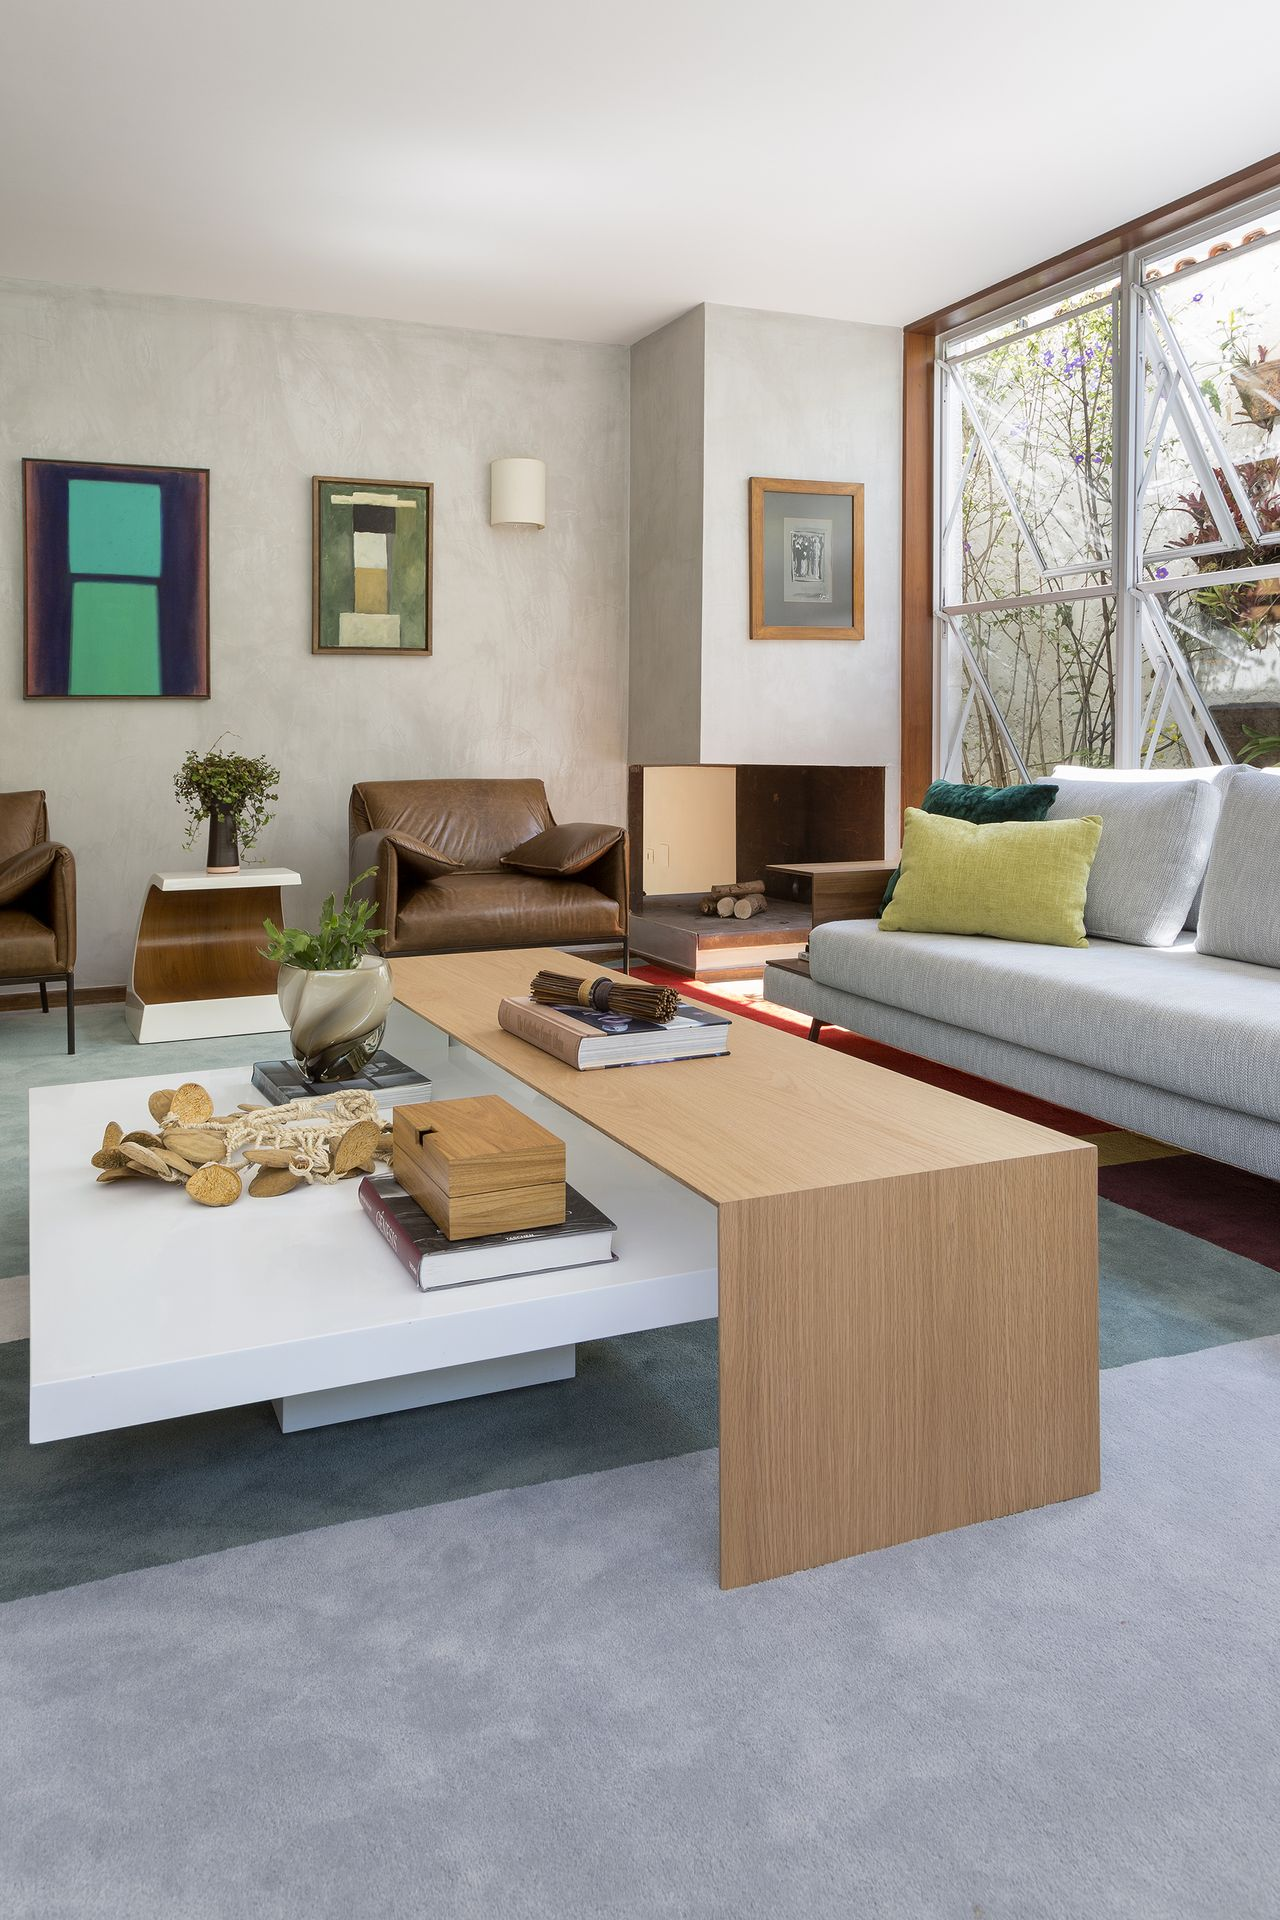 Parede E Piso De Cimento Queimado De D Ptico Design De Interiores  -> Piso Parede Sala